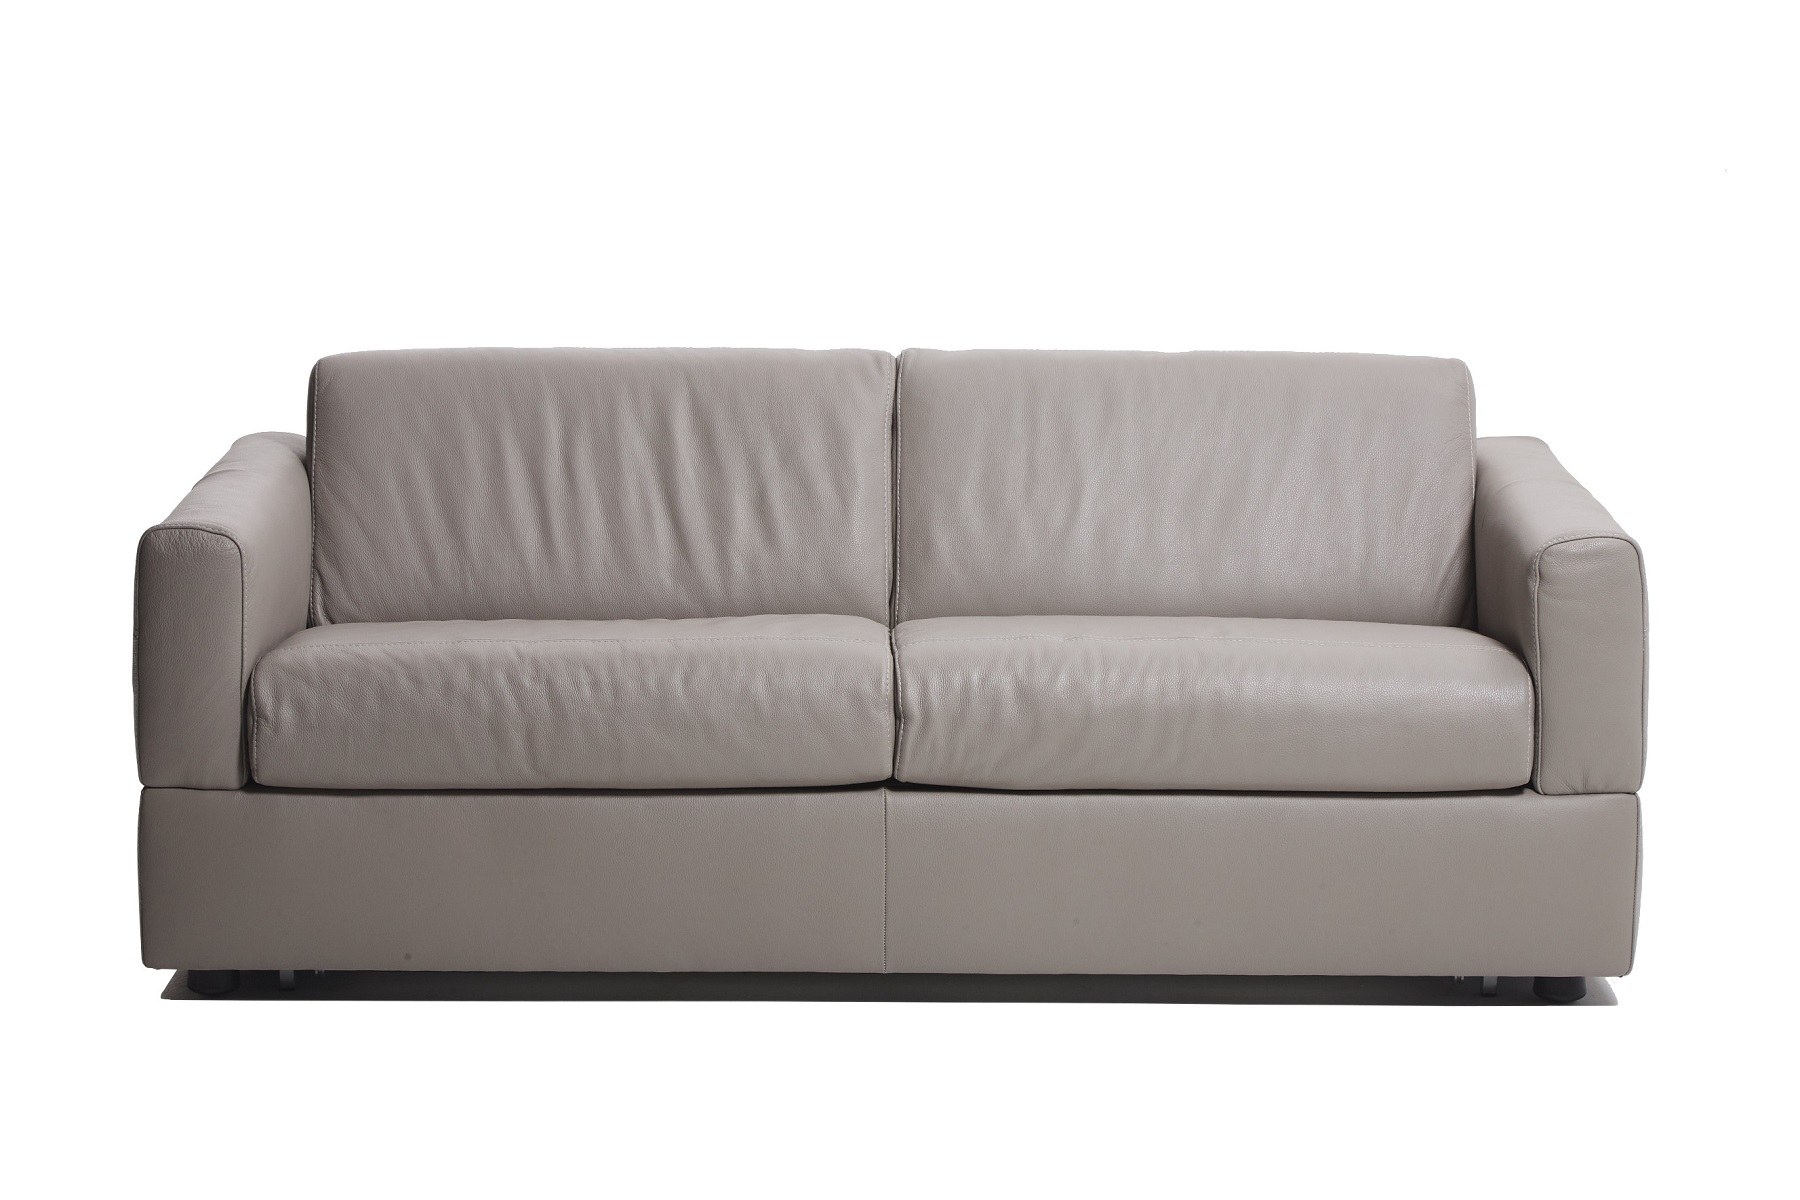 Visconti Leather Sofa Bed - Warm Grey